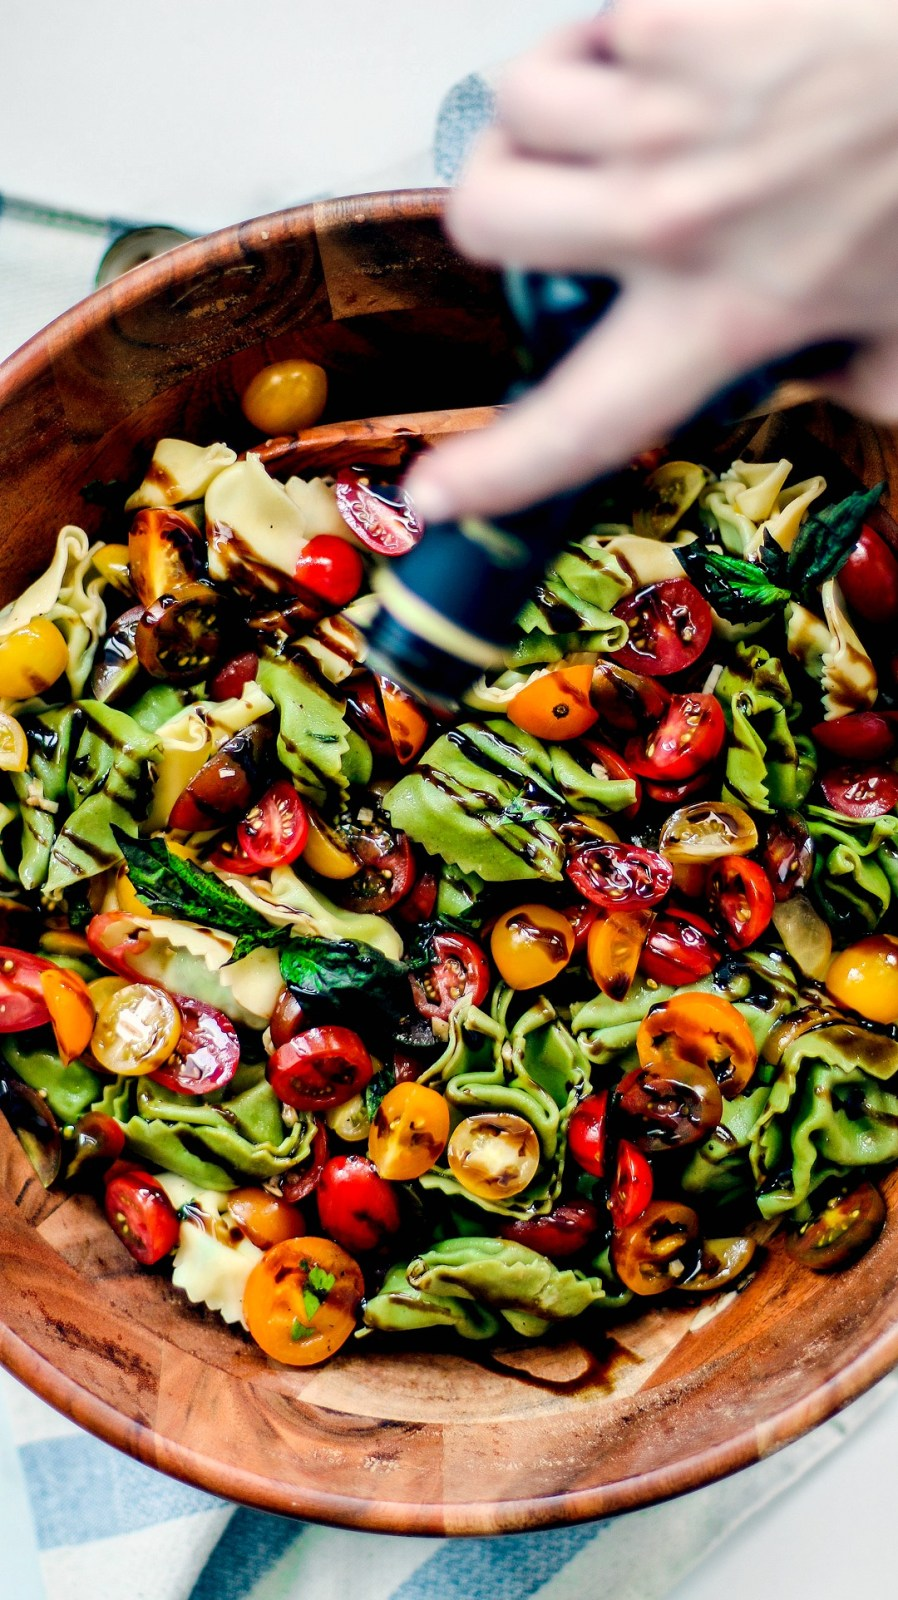 Bruschetta pasta salad being drizzled with balsamic glaze.